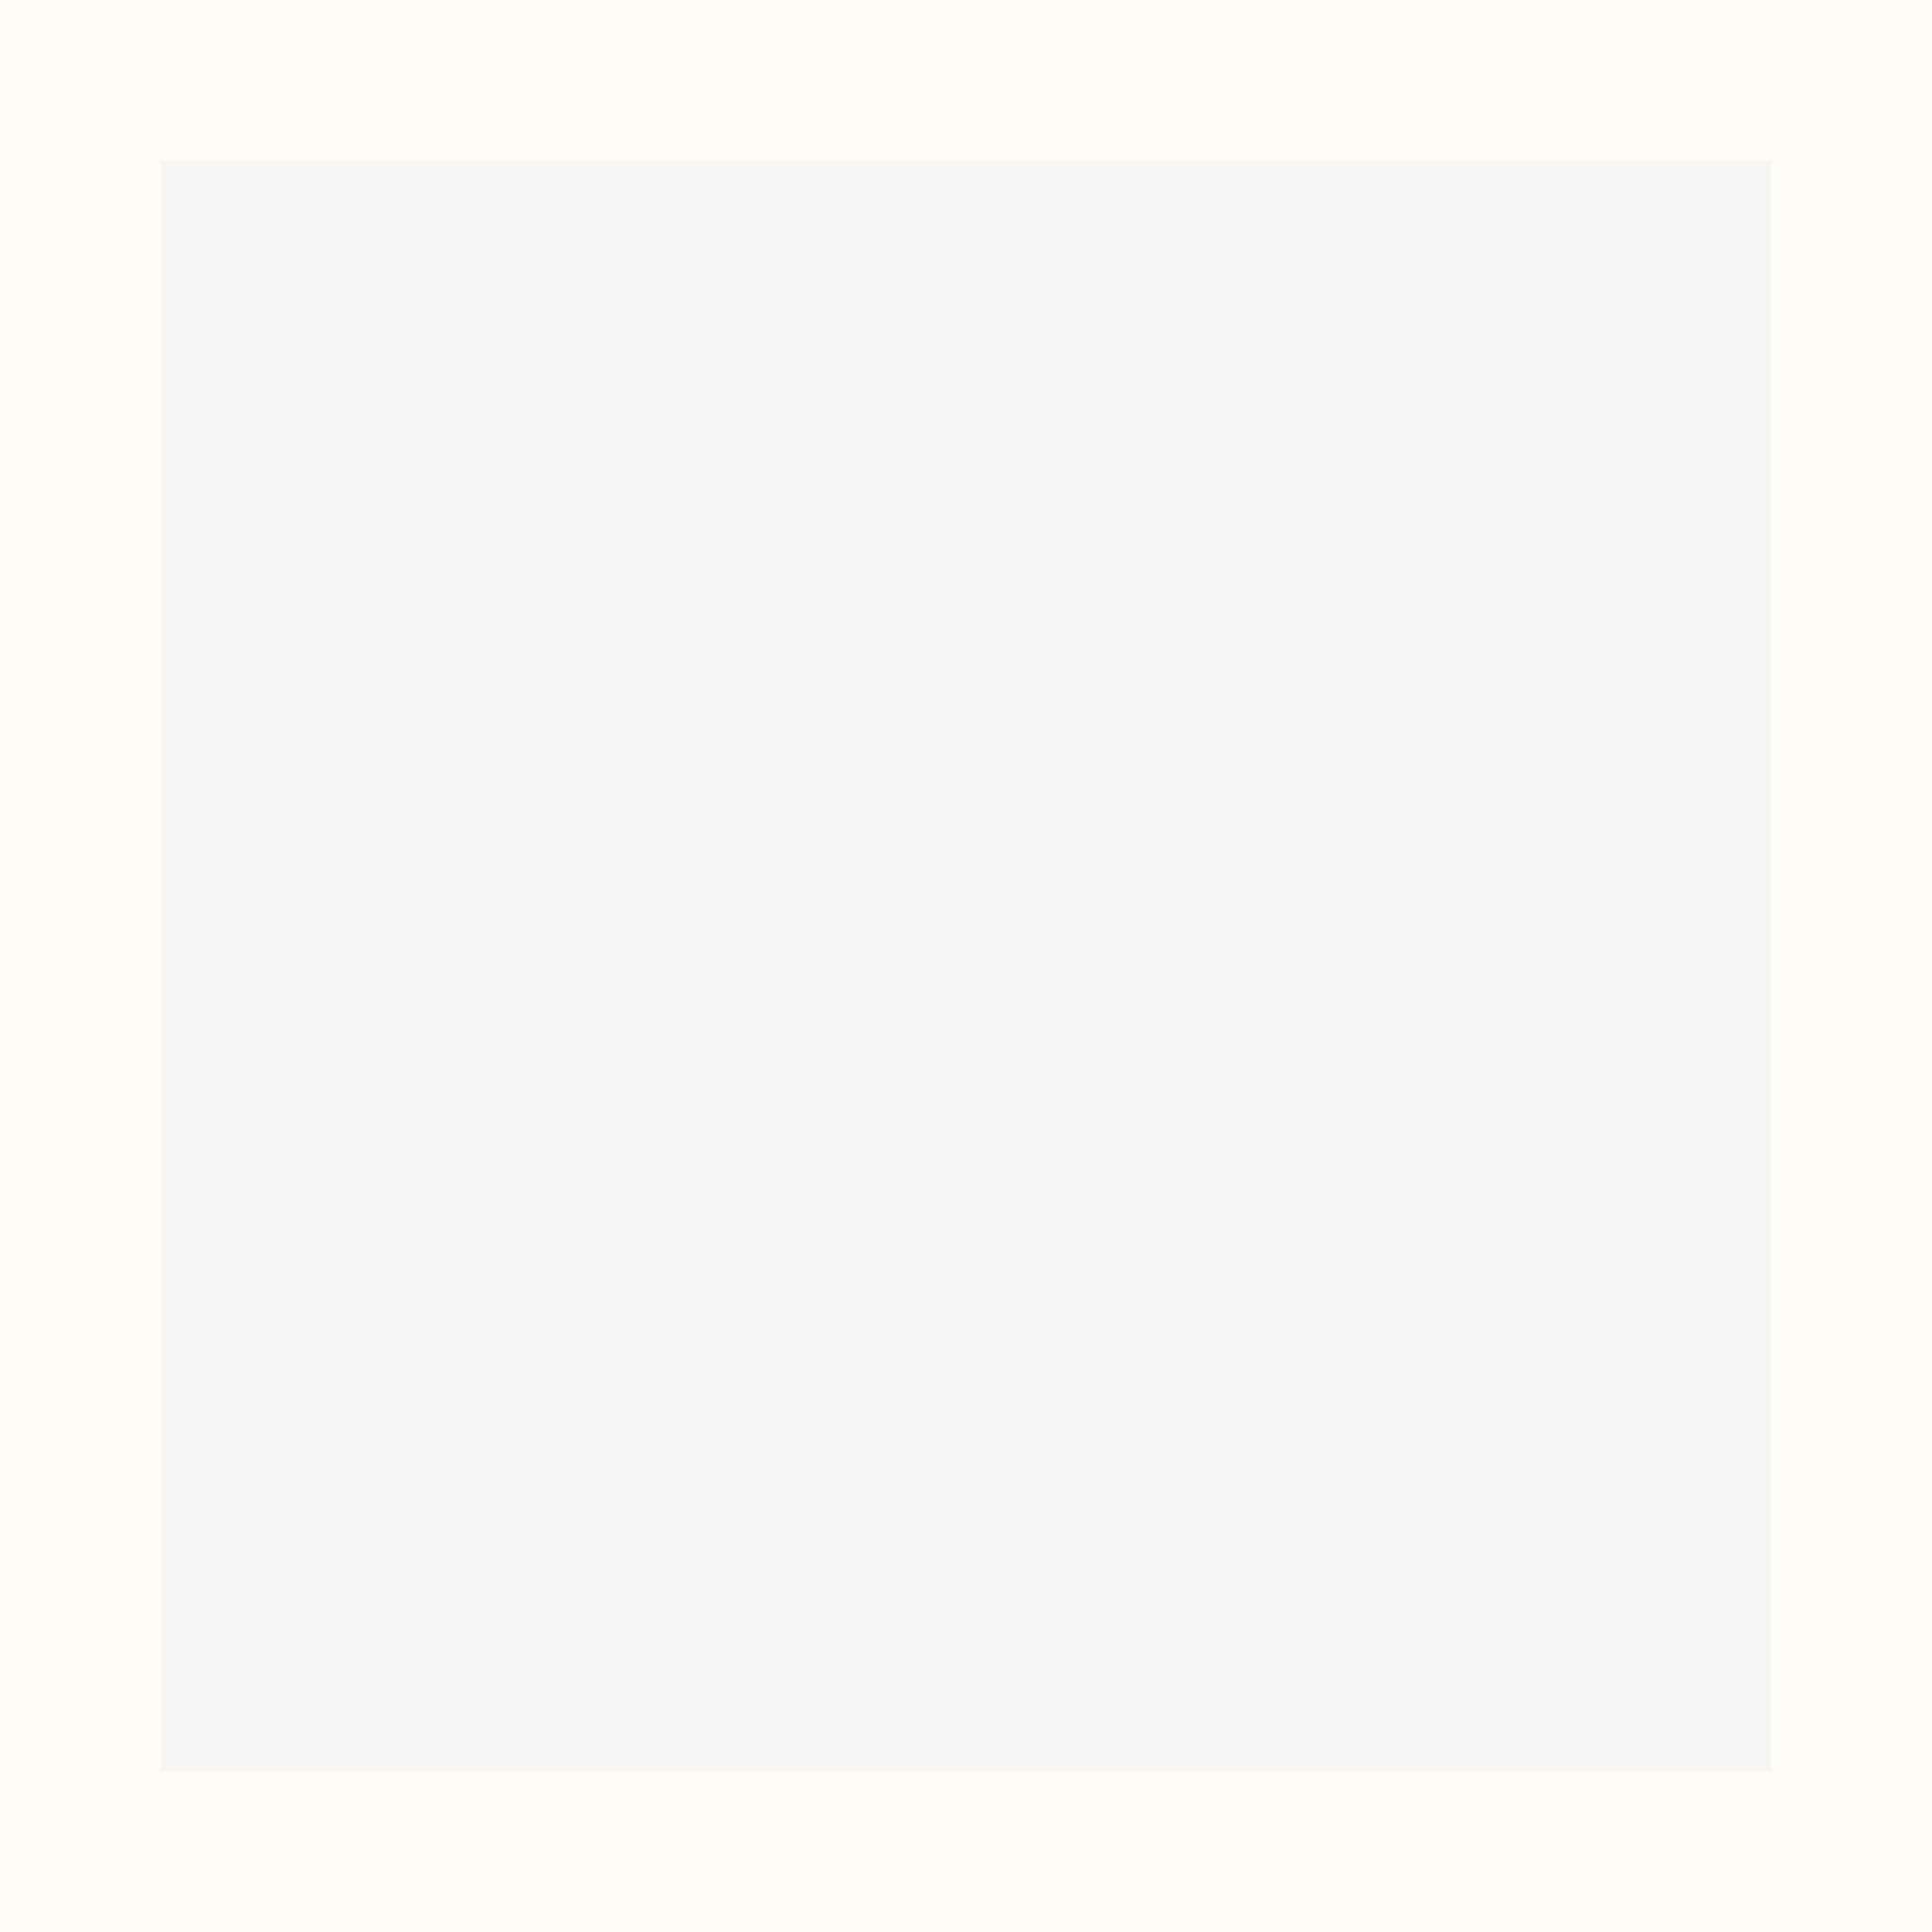 Bague Chaîne d Ancre Punk, petit modèle   Hermès bda157321b4